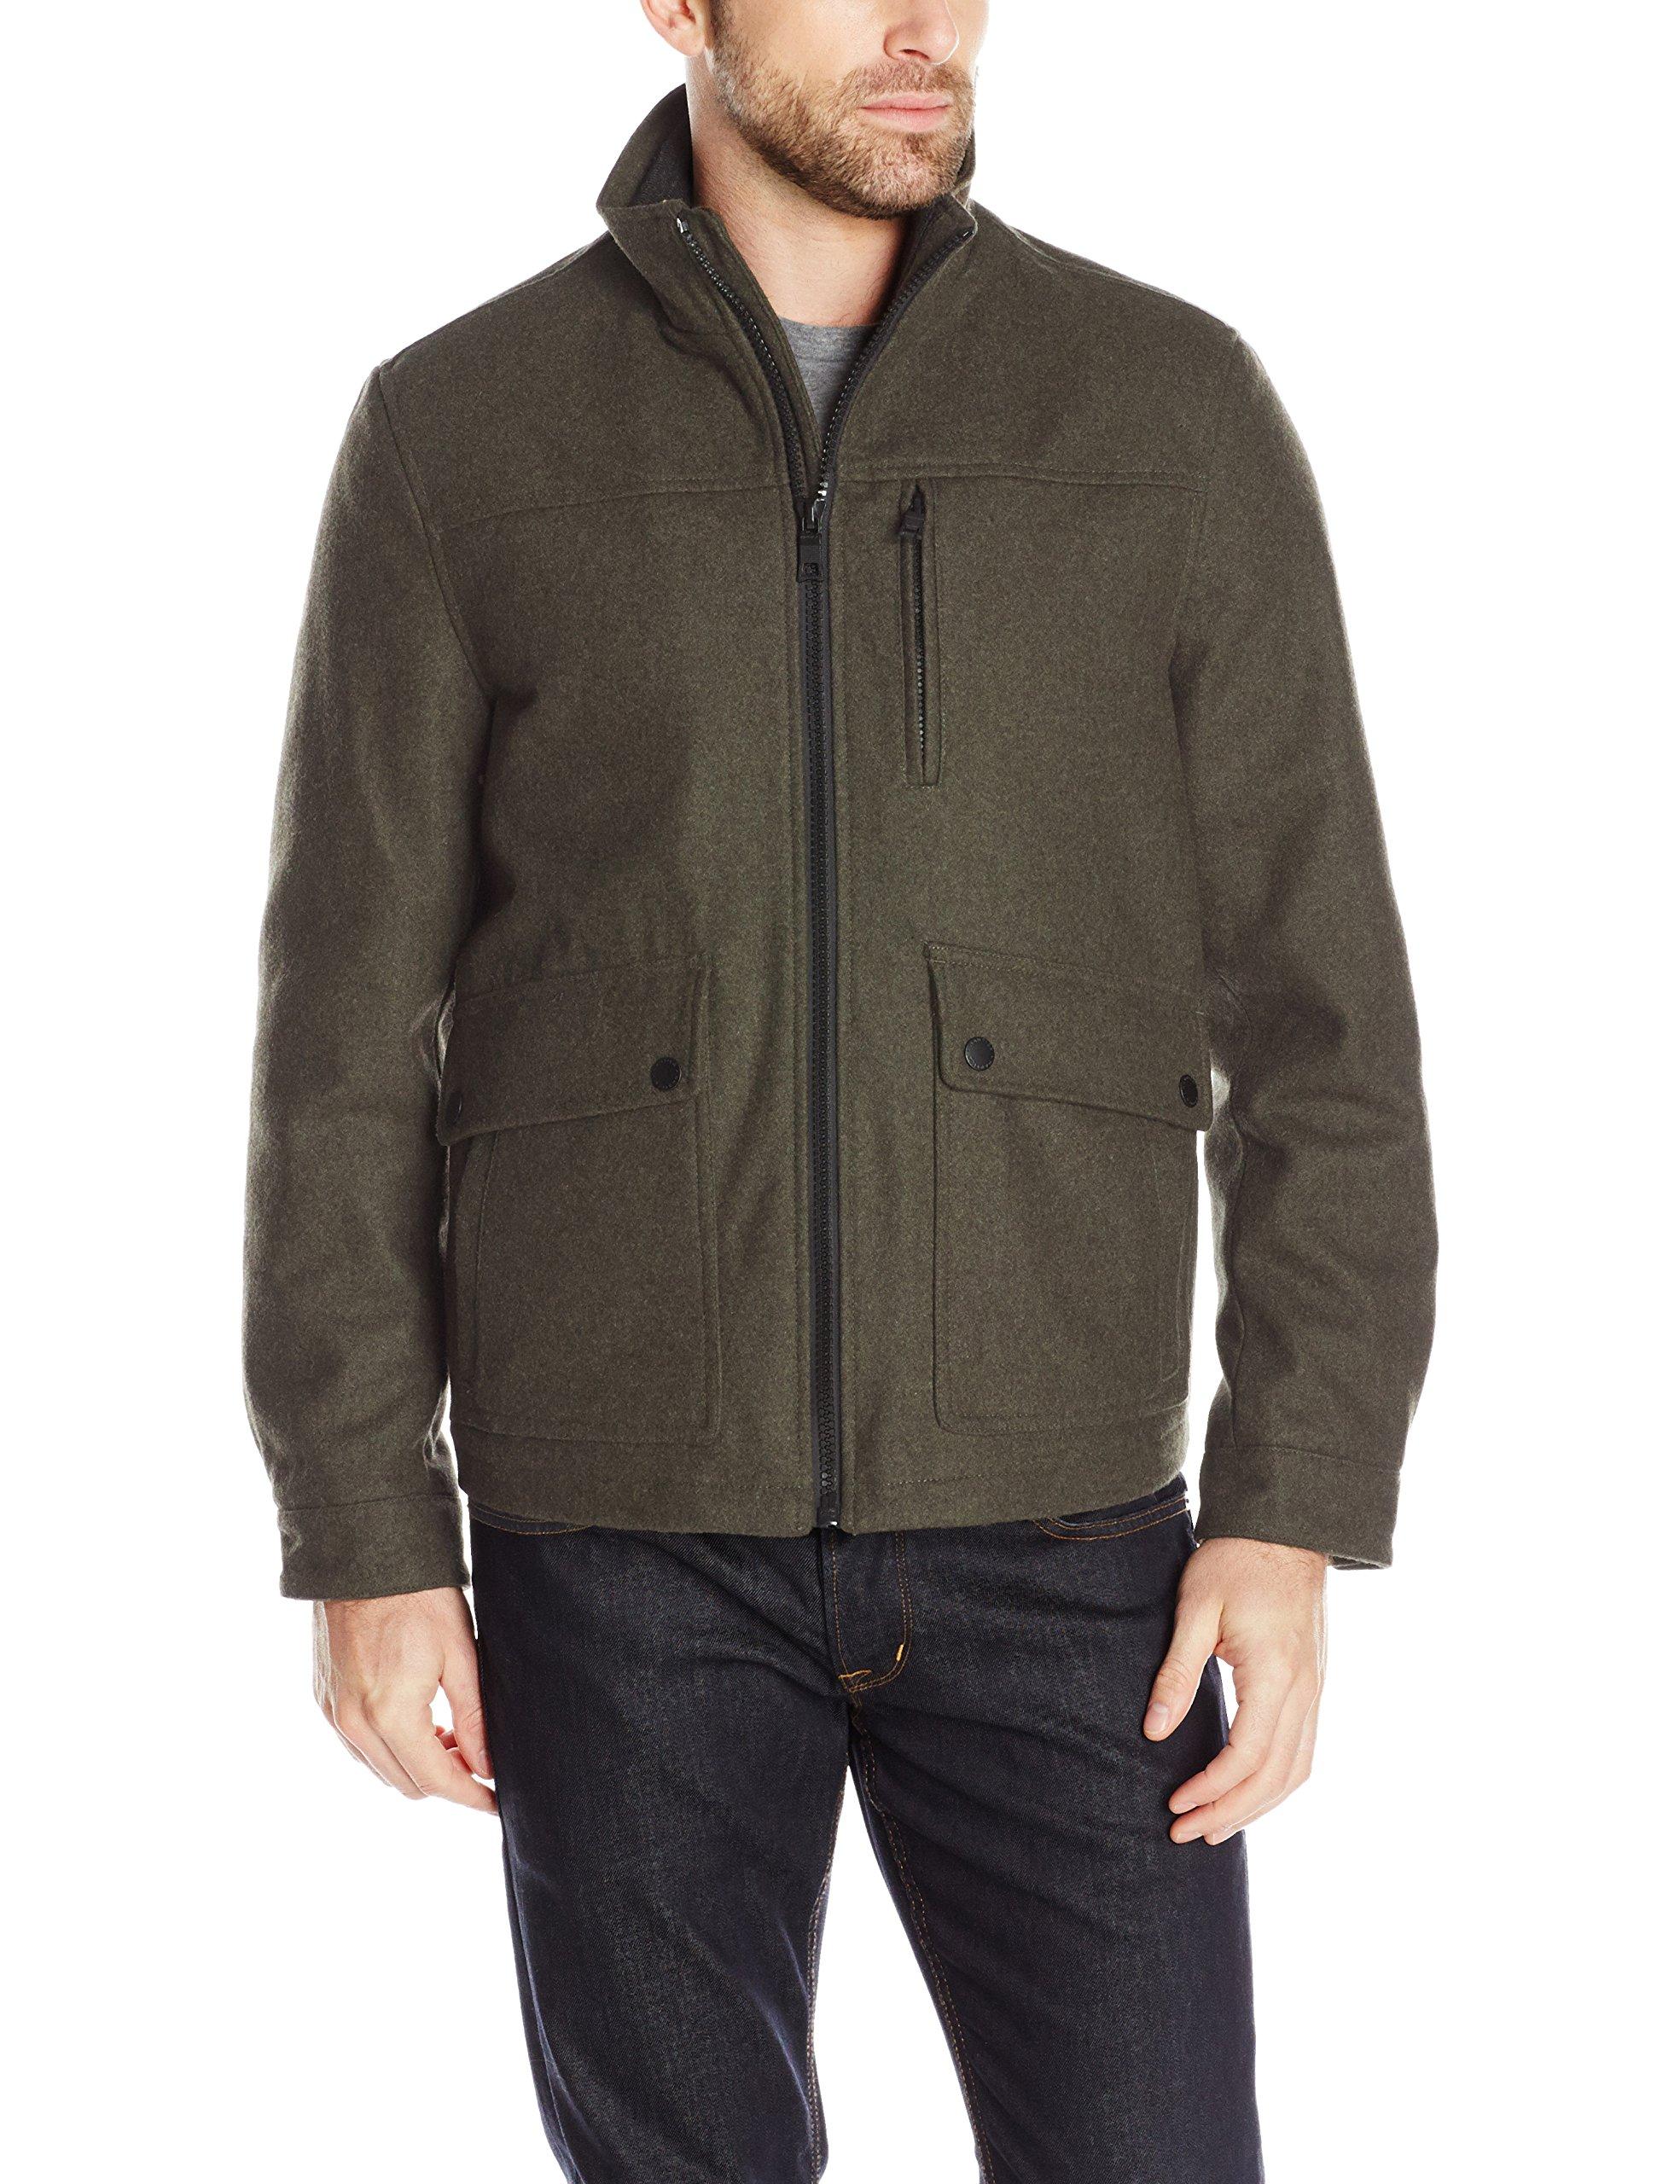 Nautica Men's Wool Melton Jacket, Loden, M